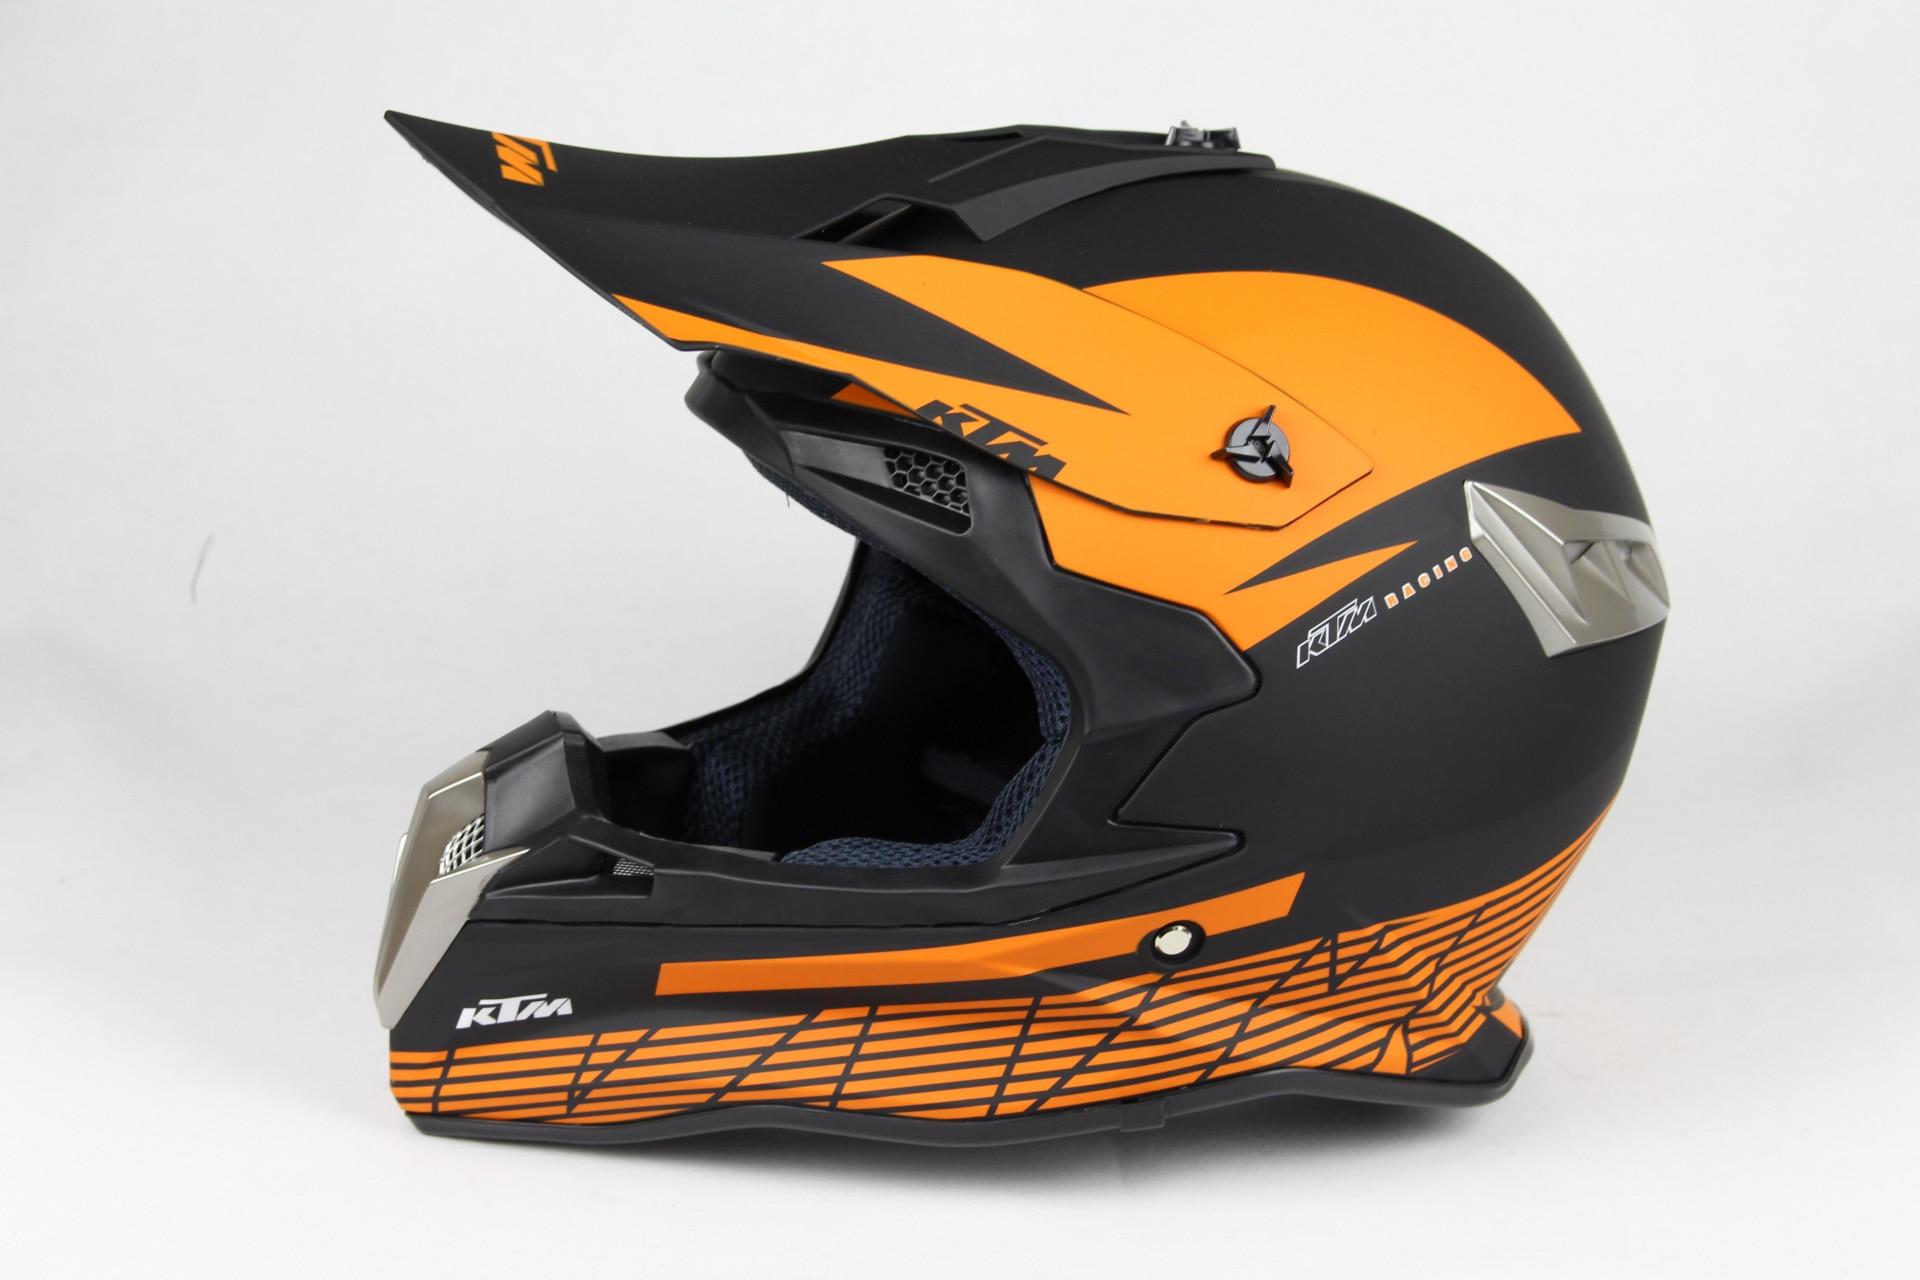 new helmets motocross ktm motorcycle helmet off road moto racing atv helmets ktm orange dot can